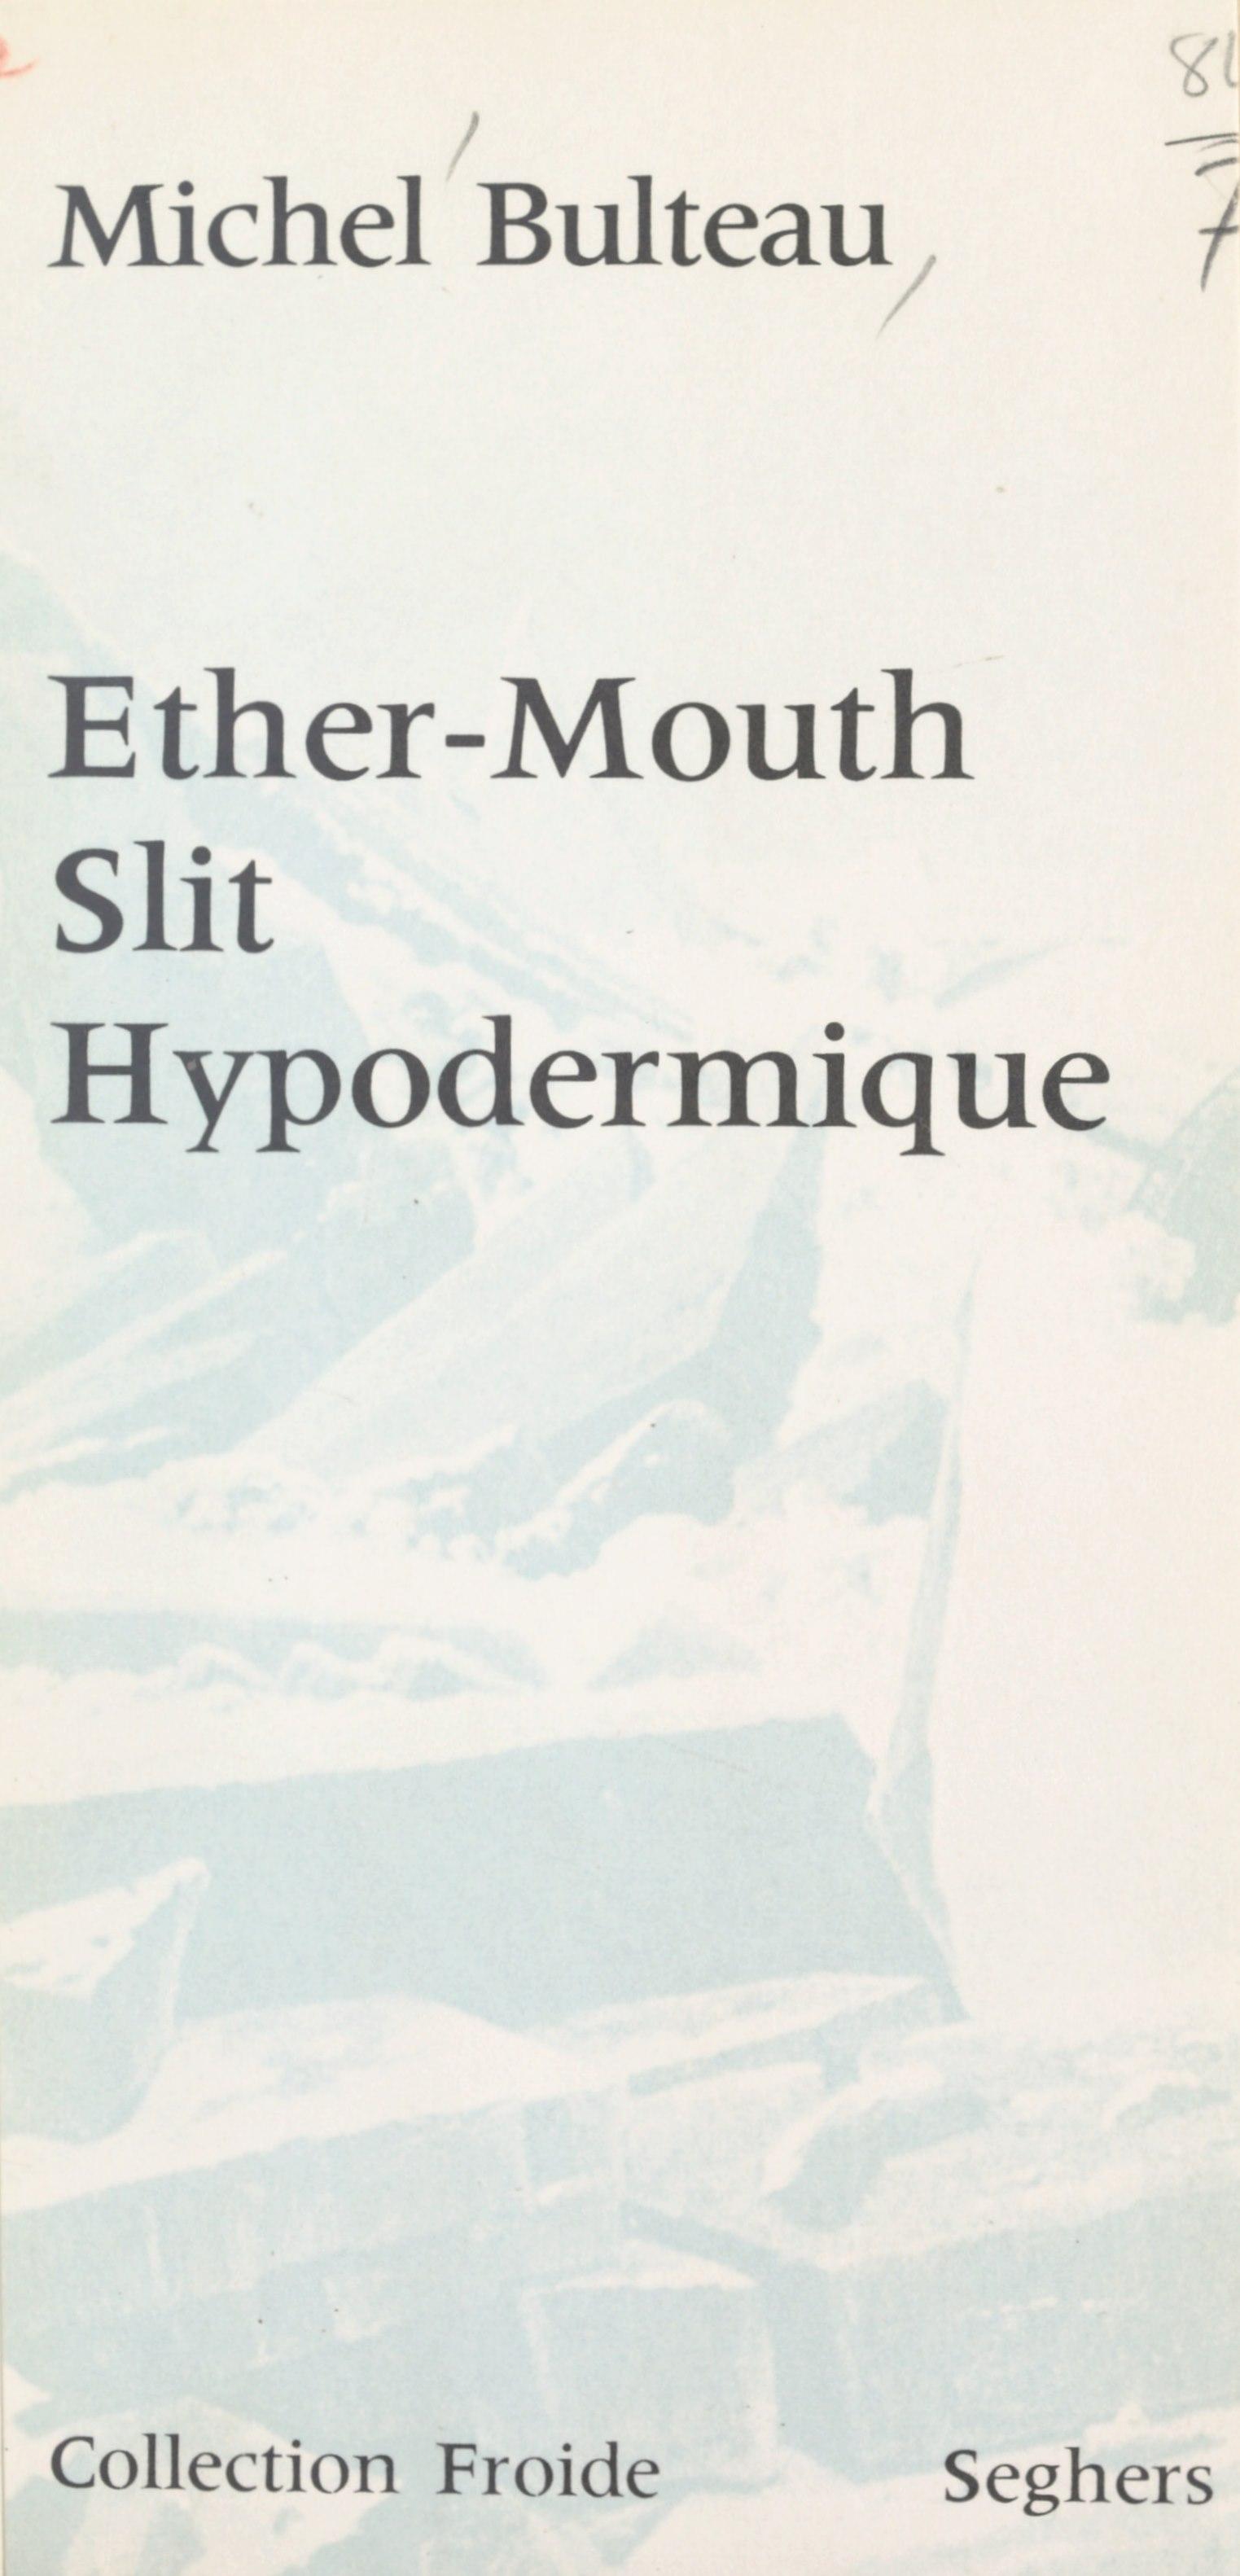 Éther-Mouth, slit, hypoderm...